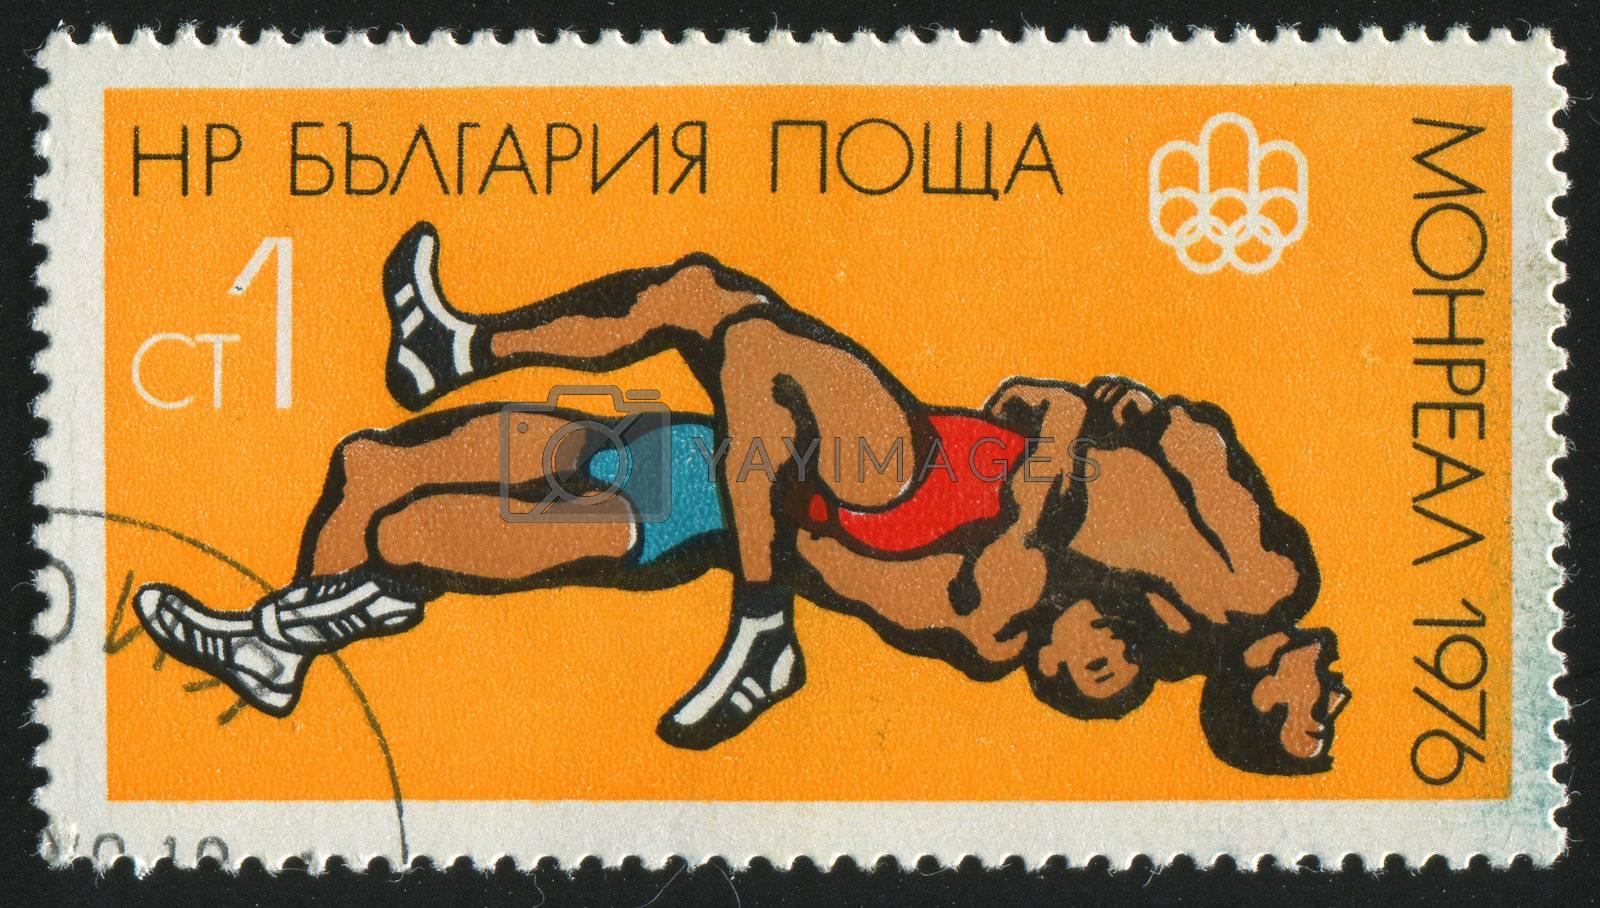 BULGARIA - CIRCA 1976: stamp printed by Bulgaria, shows wrestling, circa 1976.